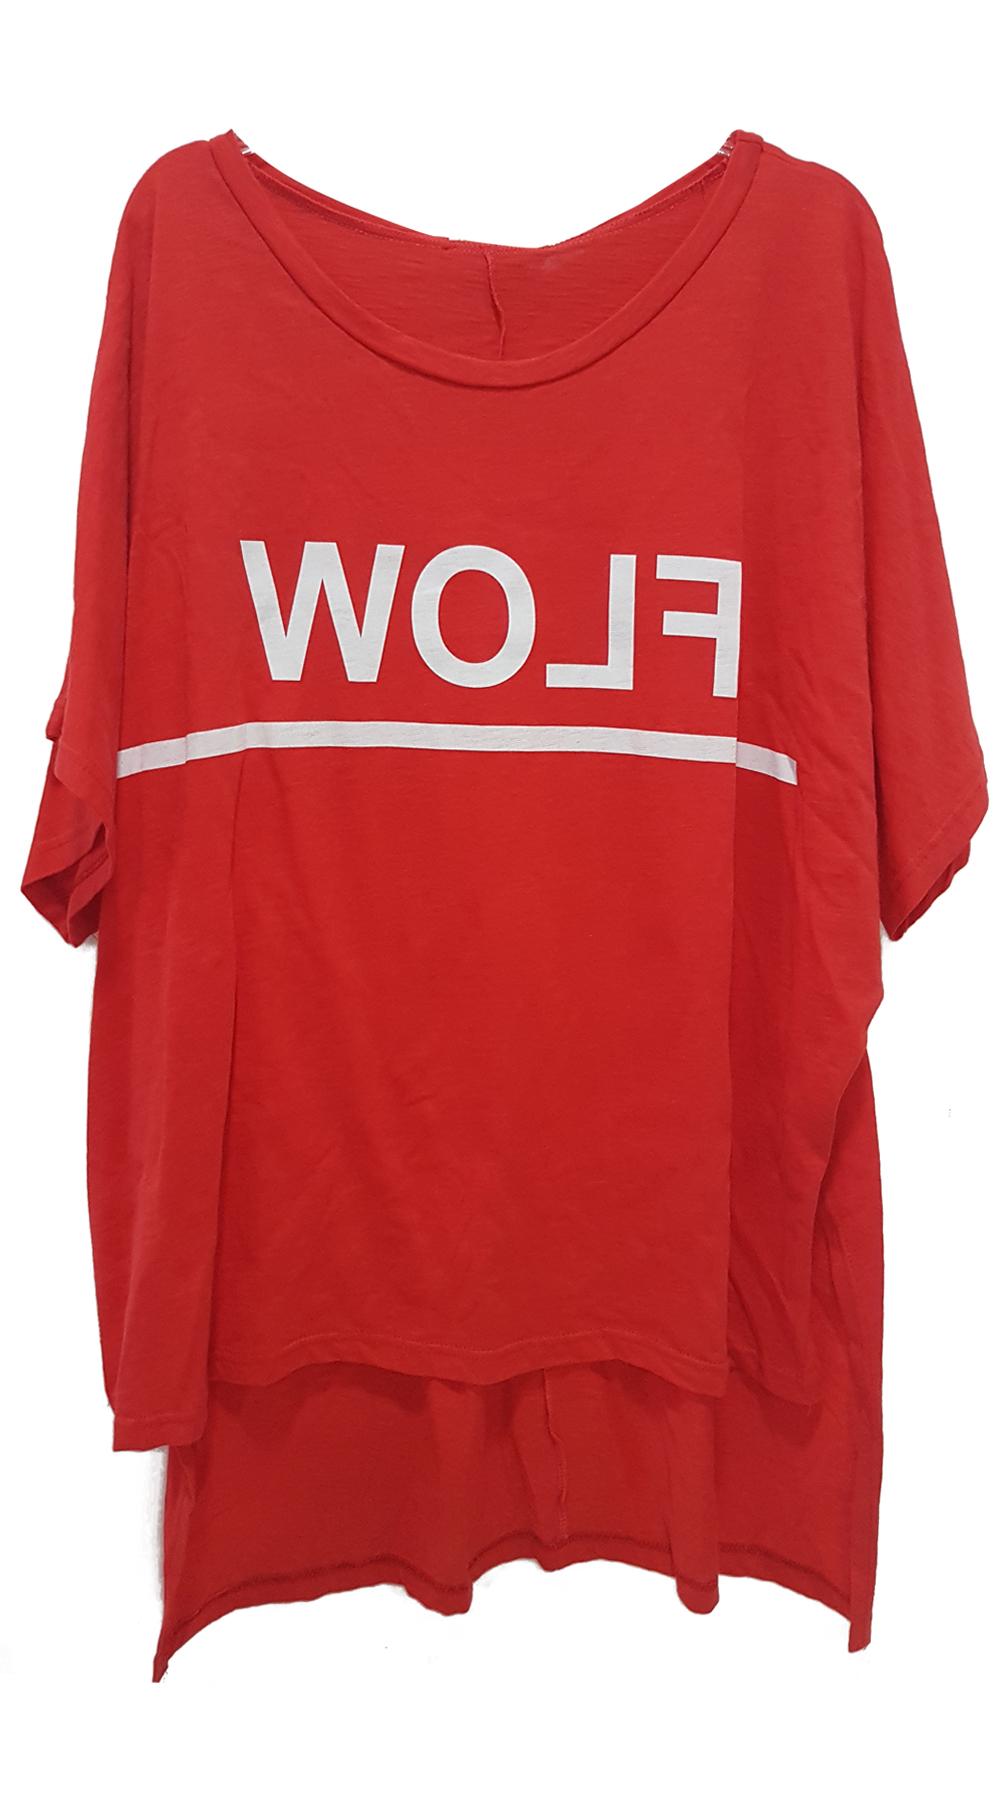 Curvy Γυναικείο βαμβακερό t-shirt FLOW - Greek Brands - SP18CM-C-15001 ενδύματα athletic